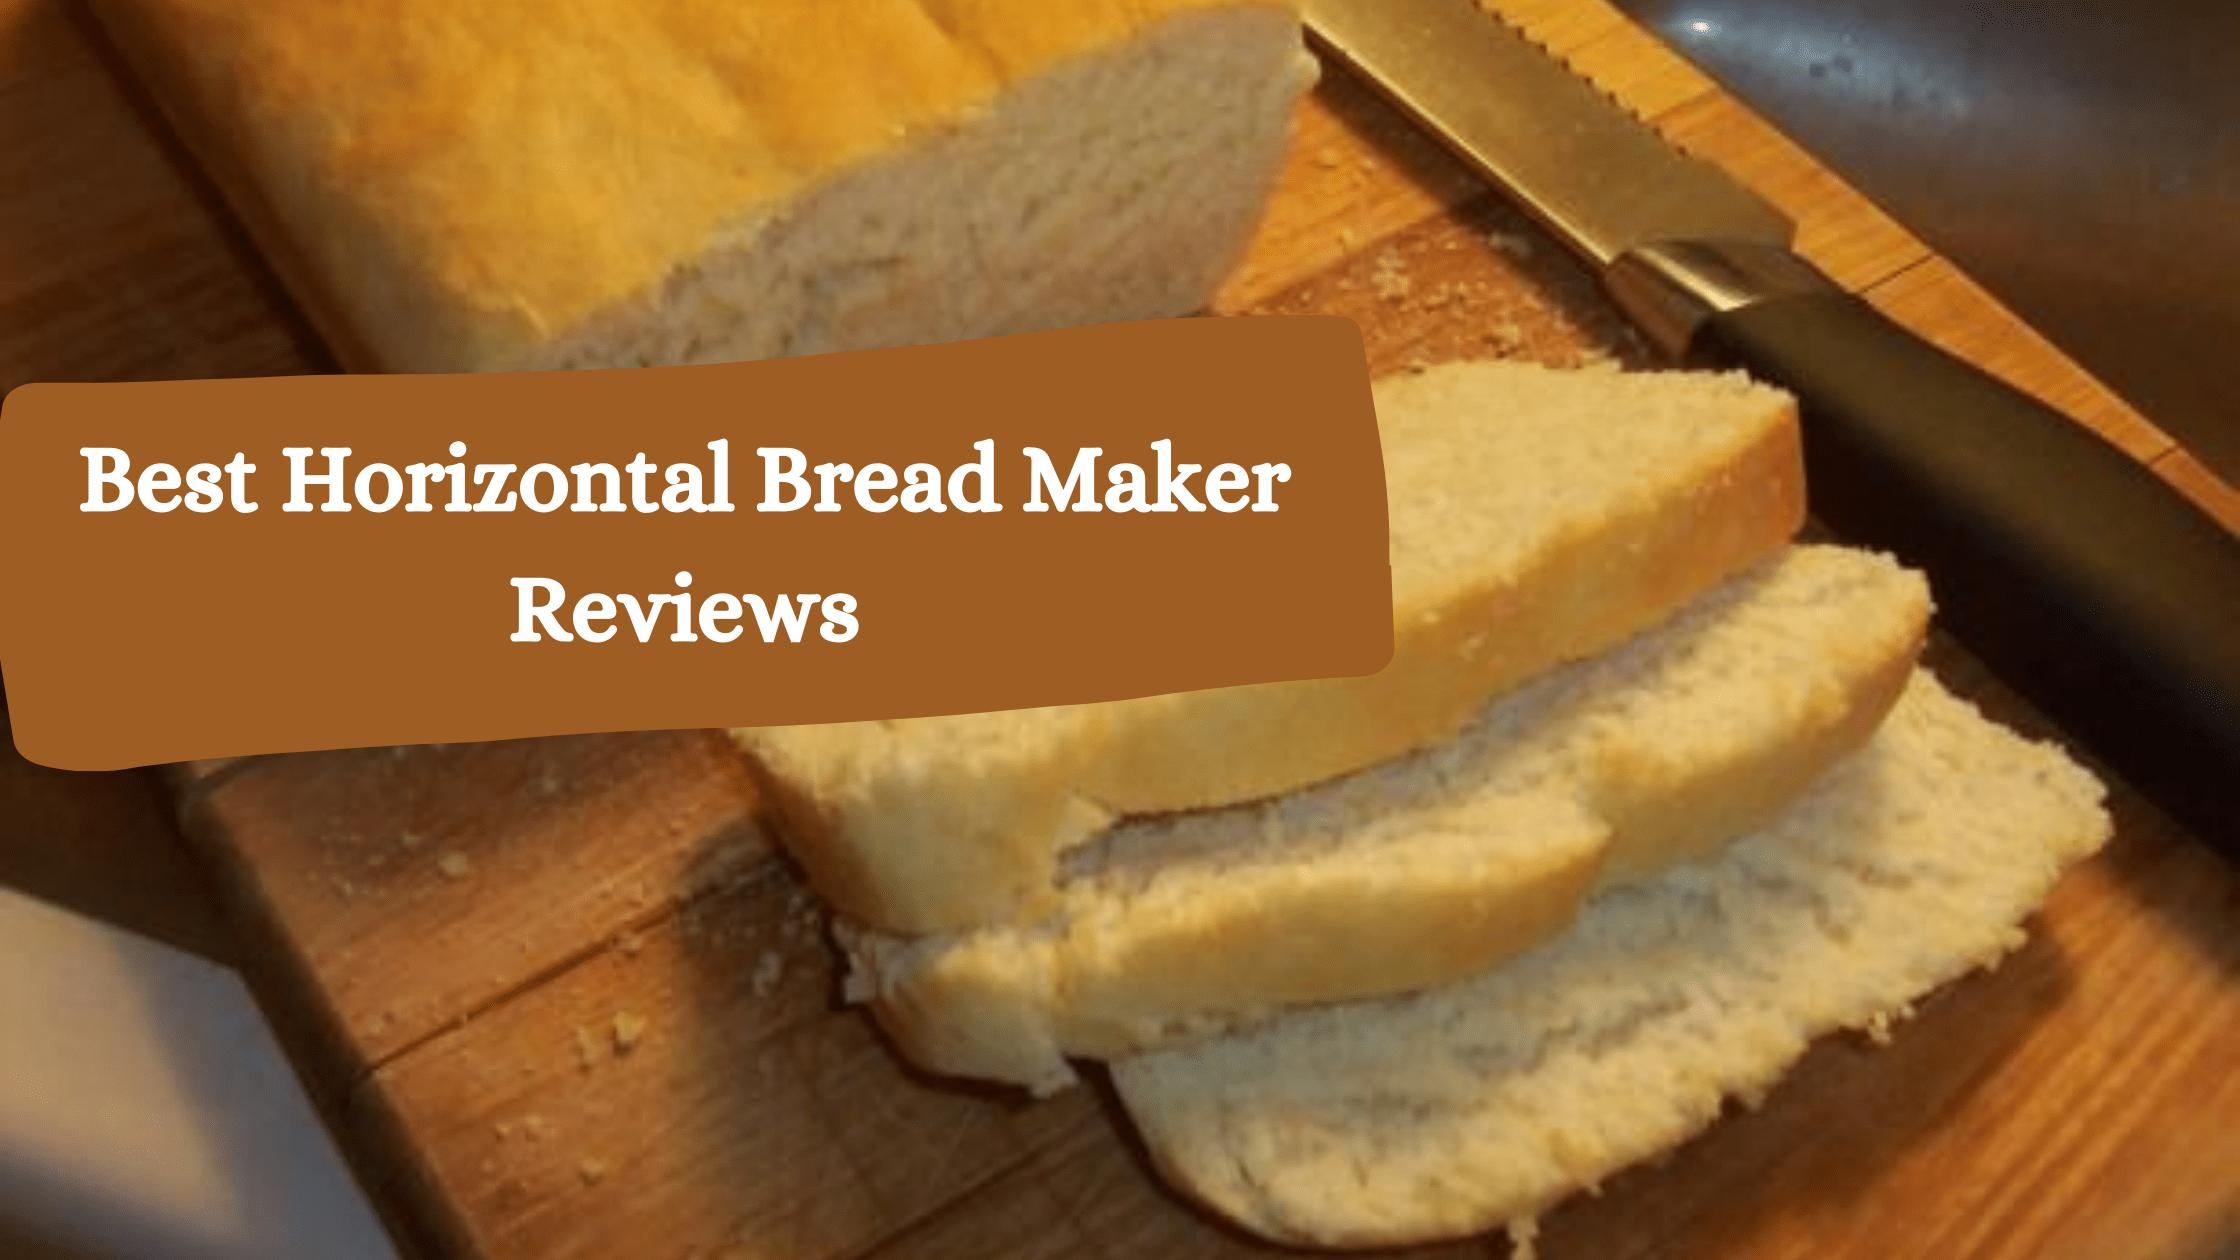 Best Horizontal Bread Maker Reviews